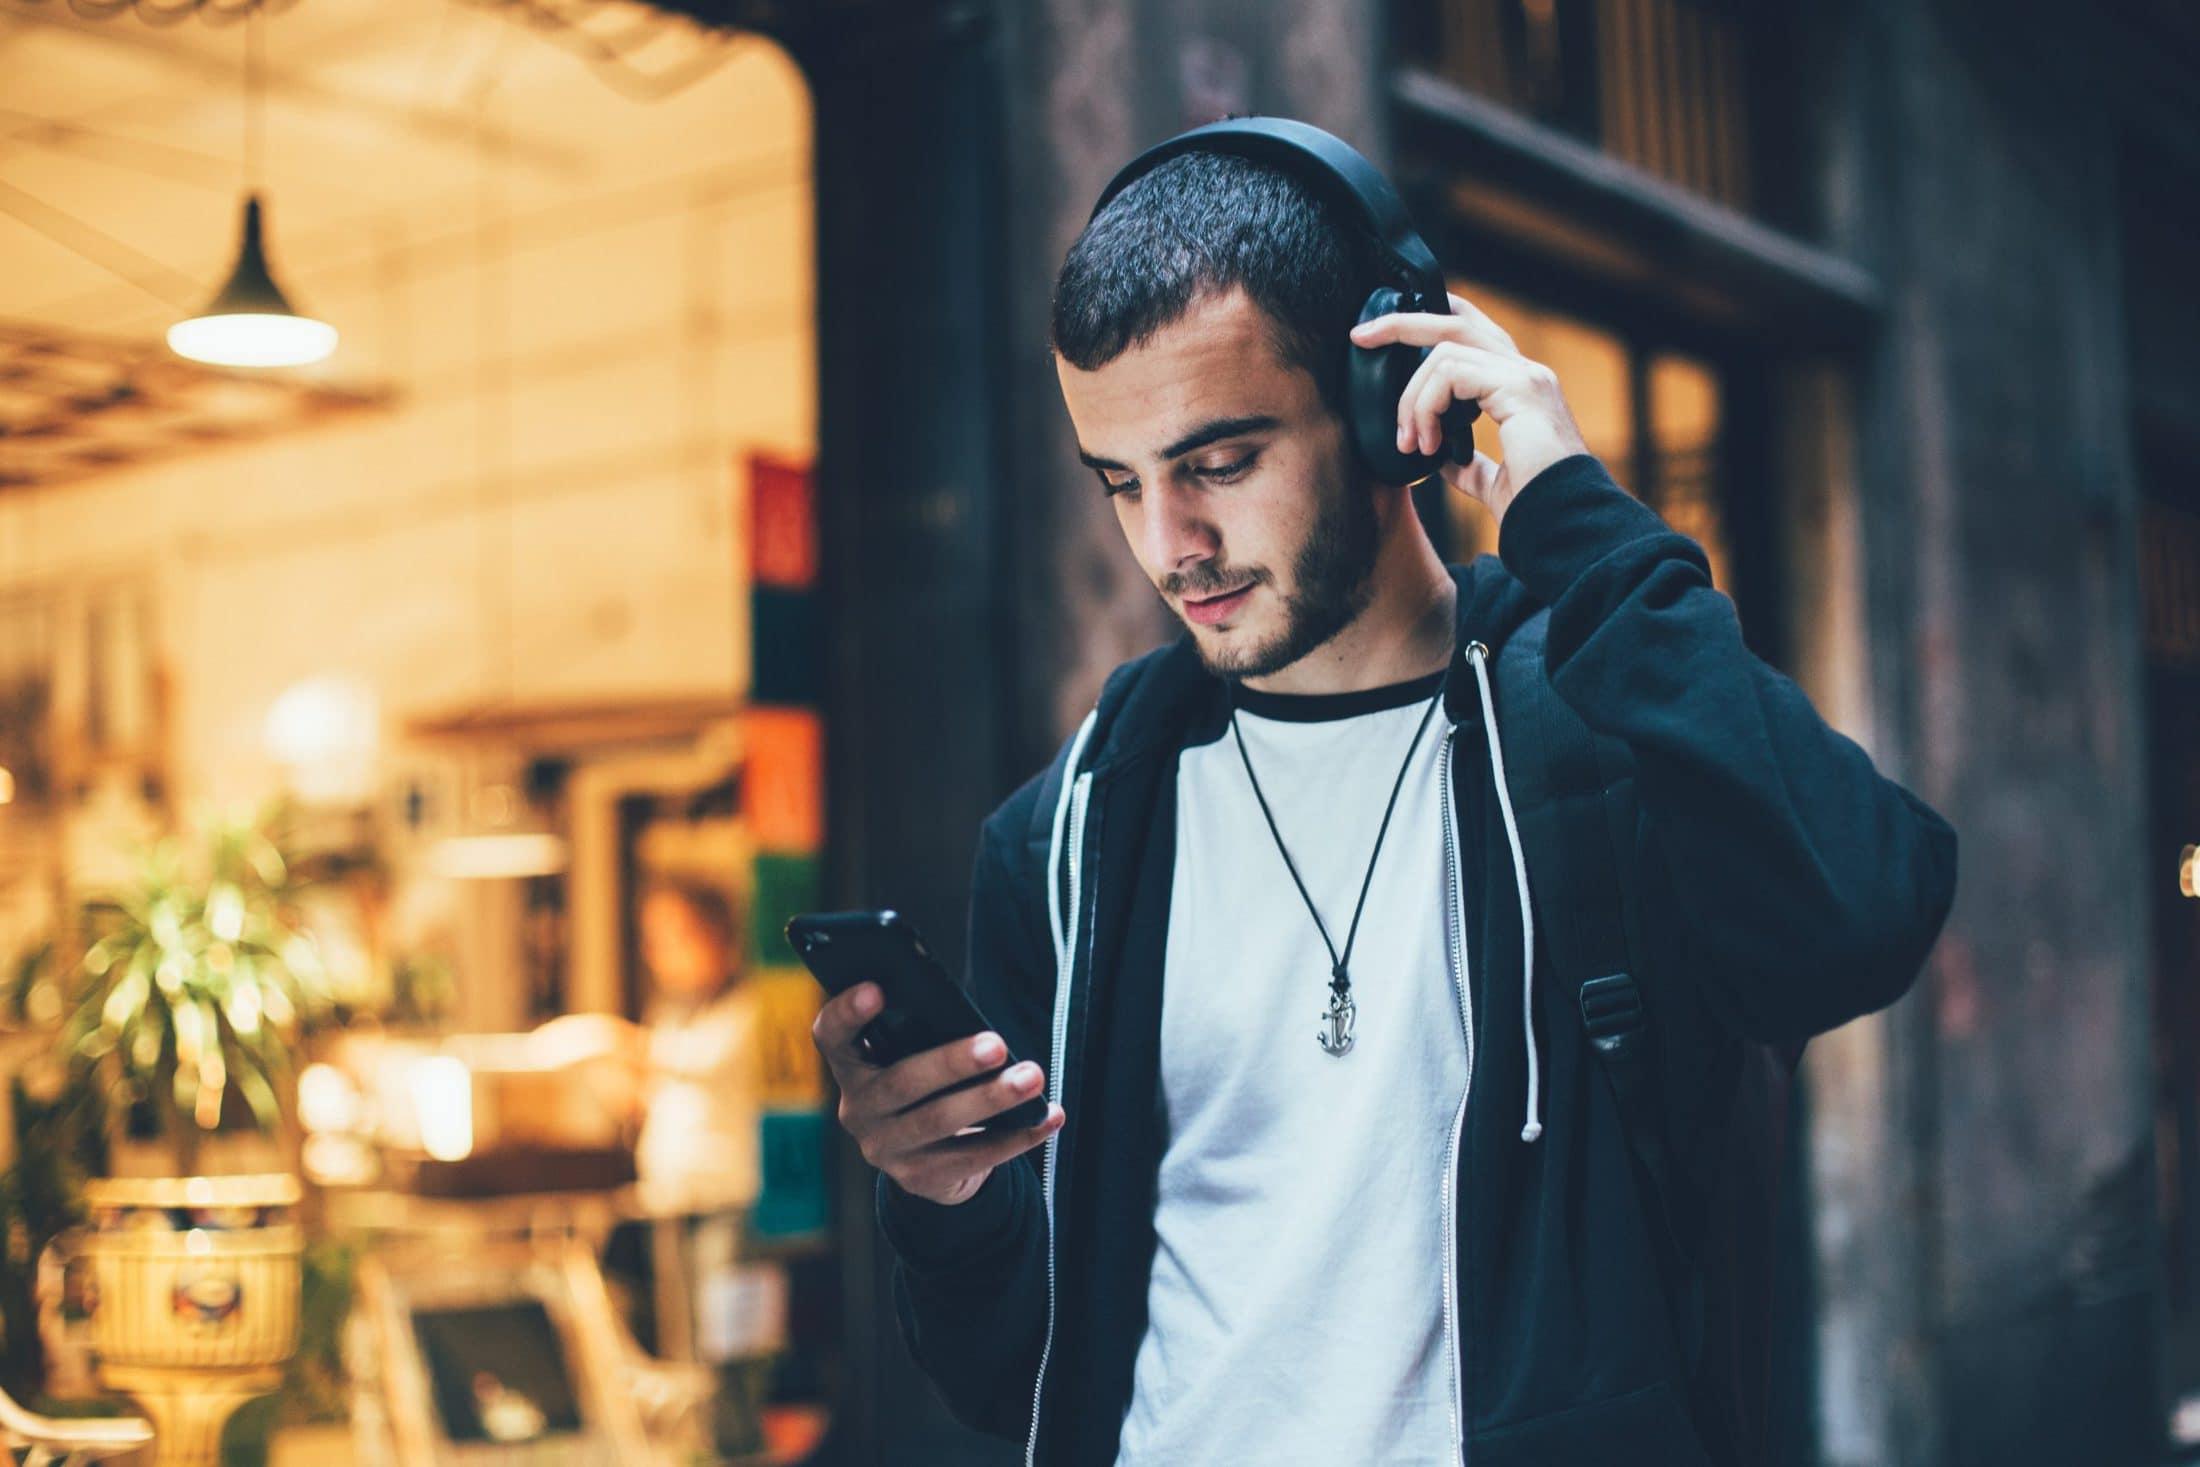 Man Listening to Music Image